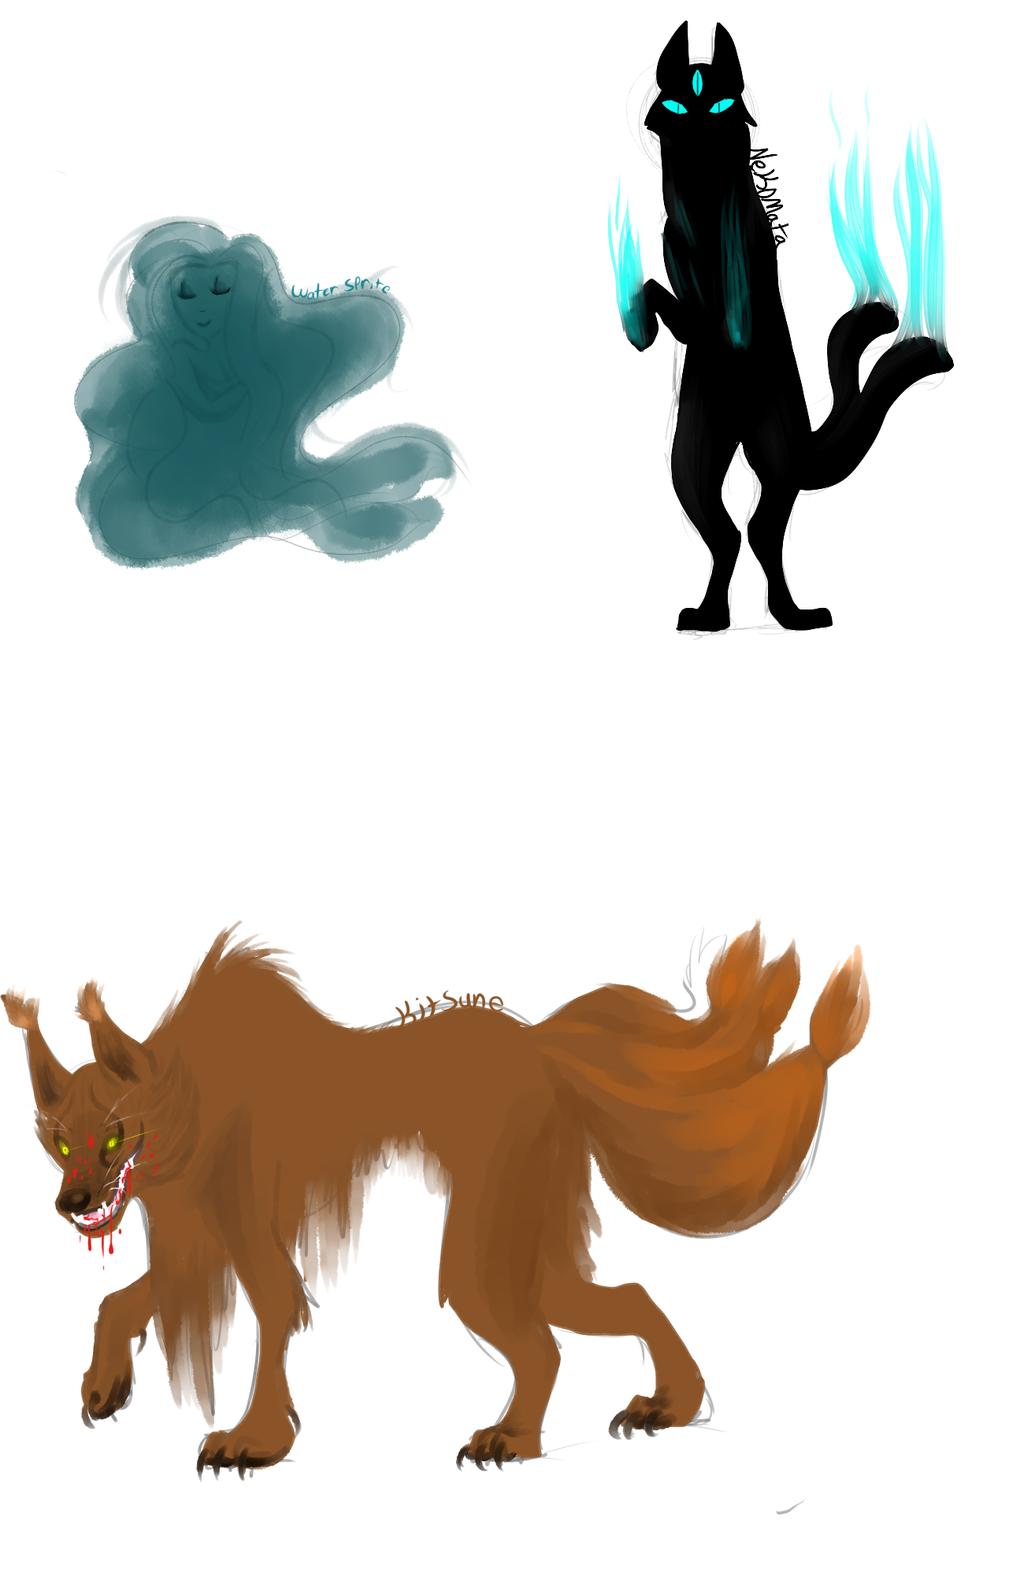 kitsunes_and_sprites_and_nekomatas_oh_my